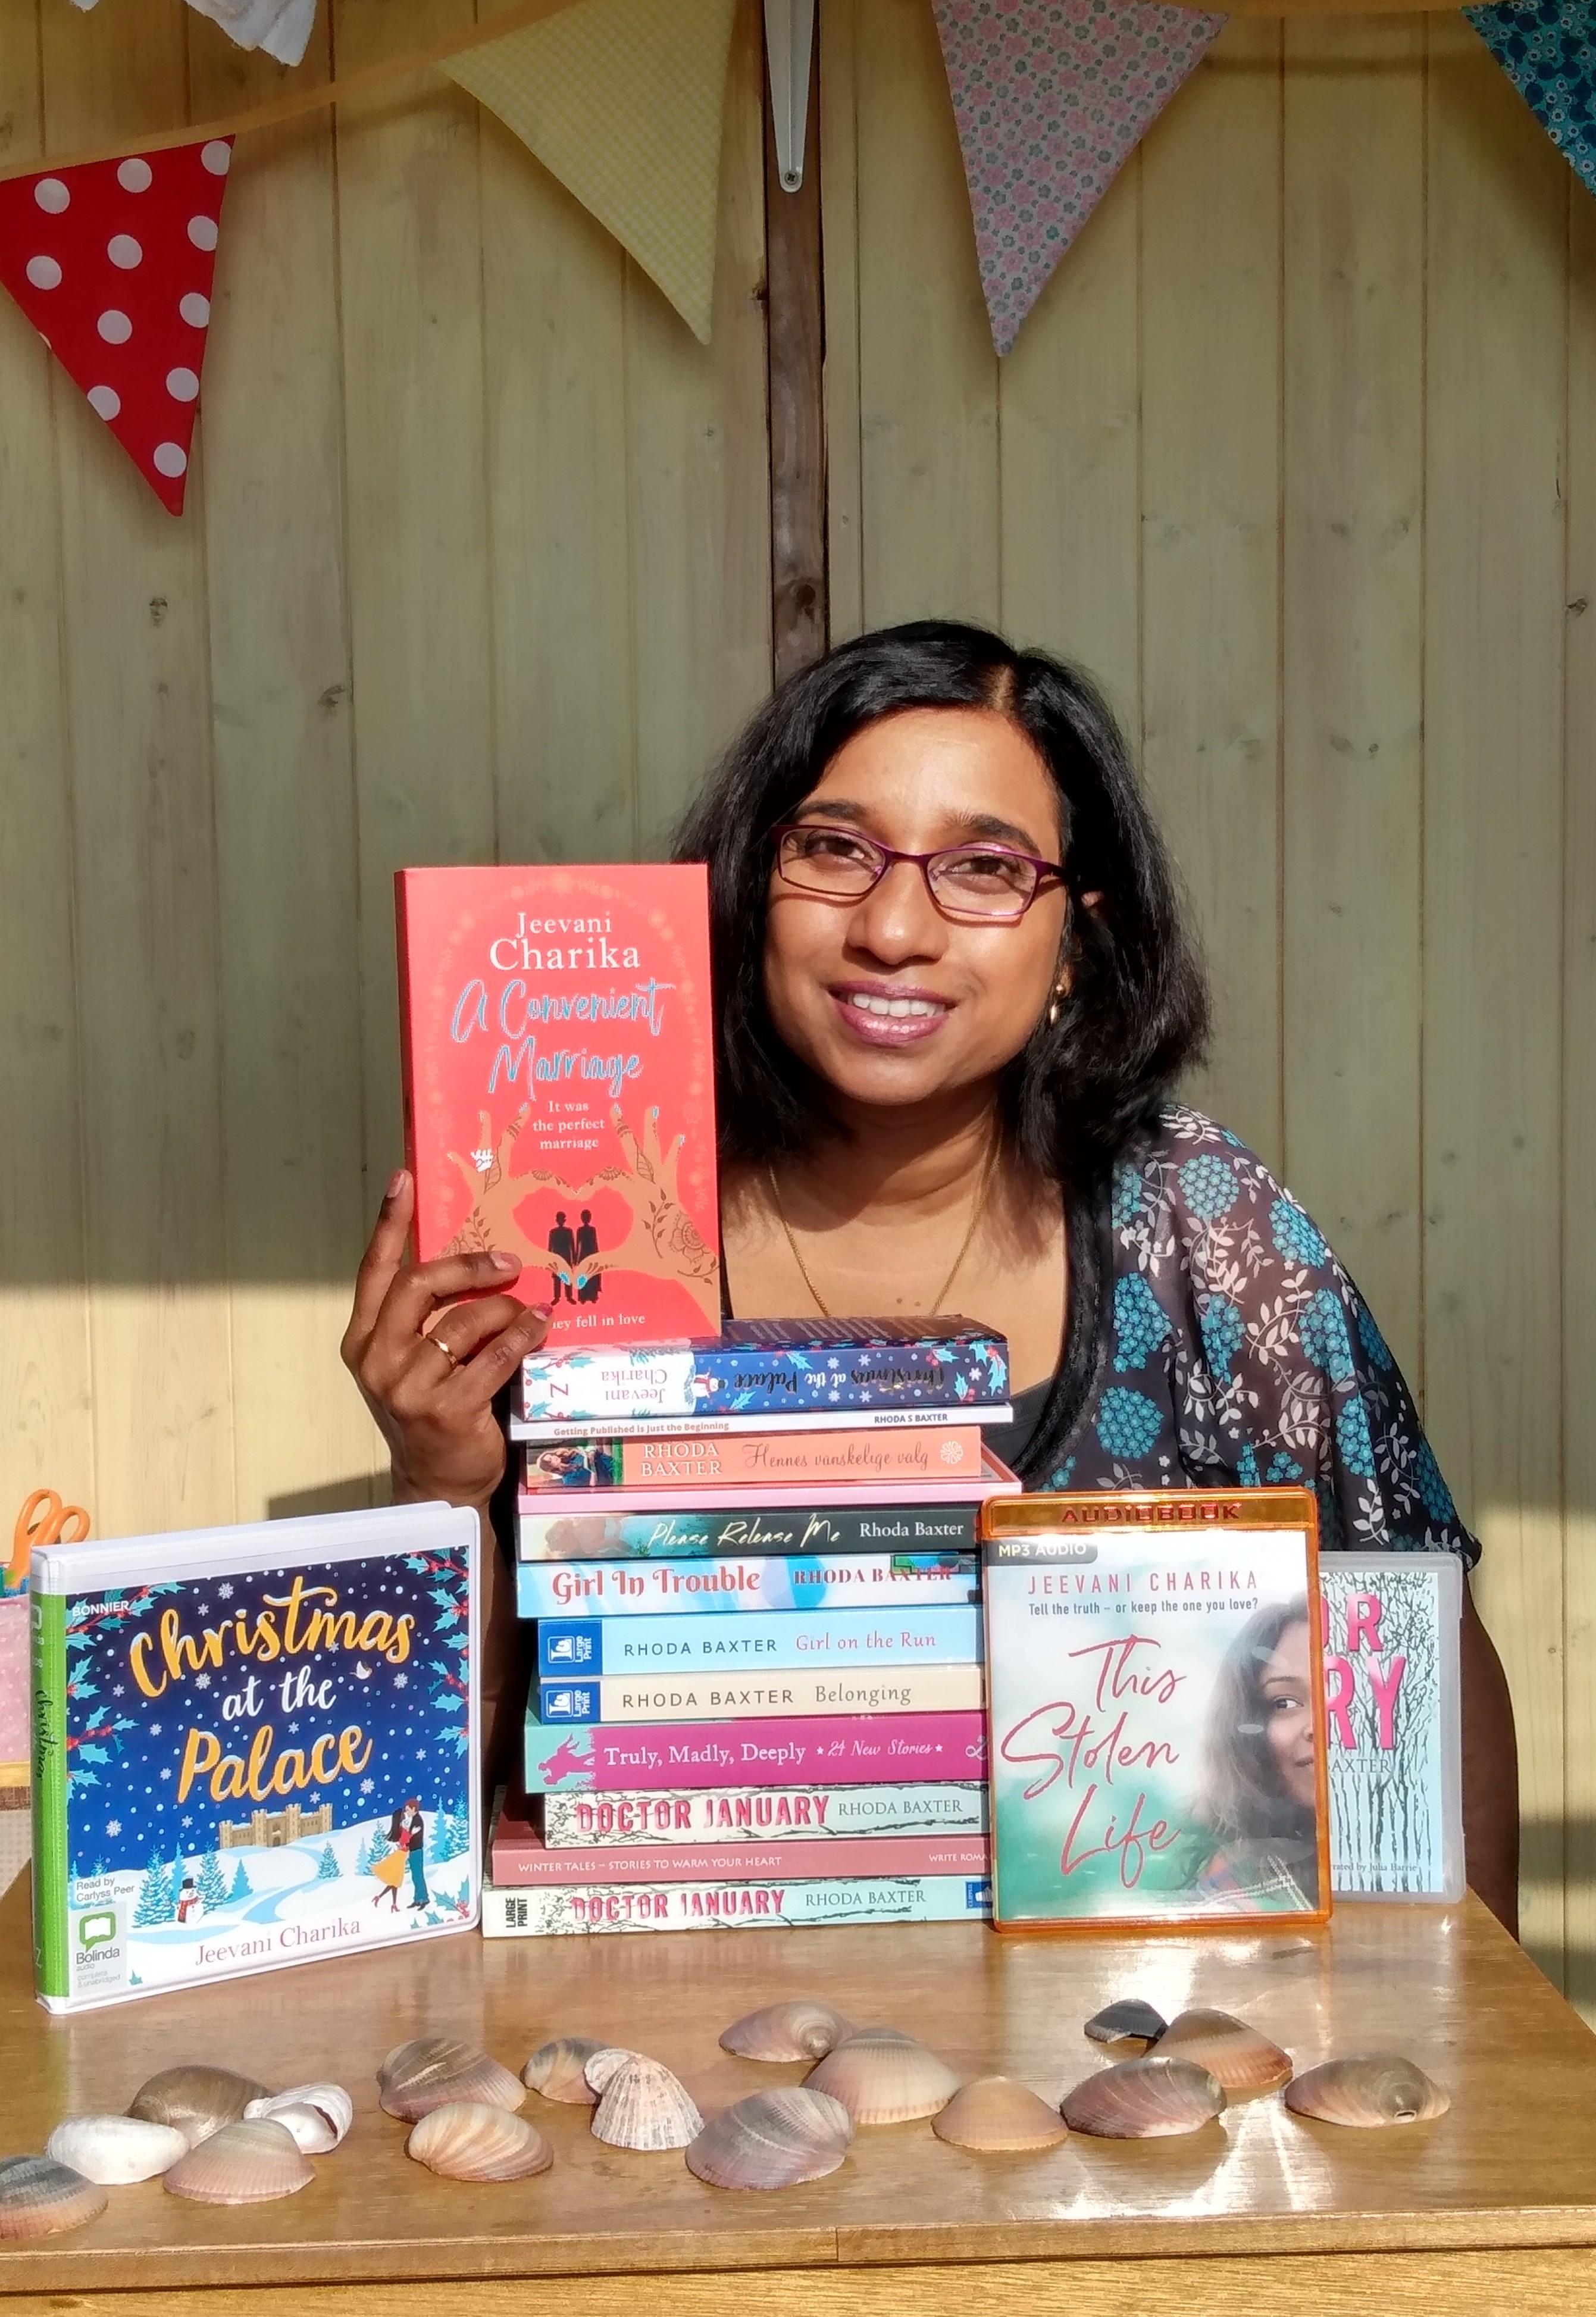 Jeevani Charika w books - Edited